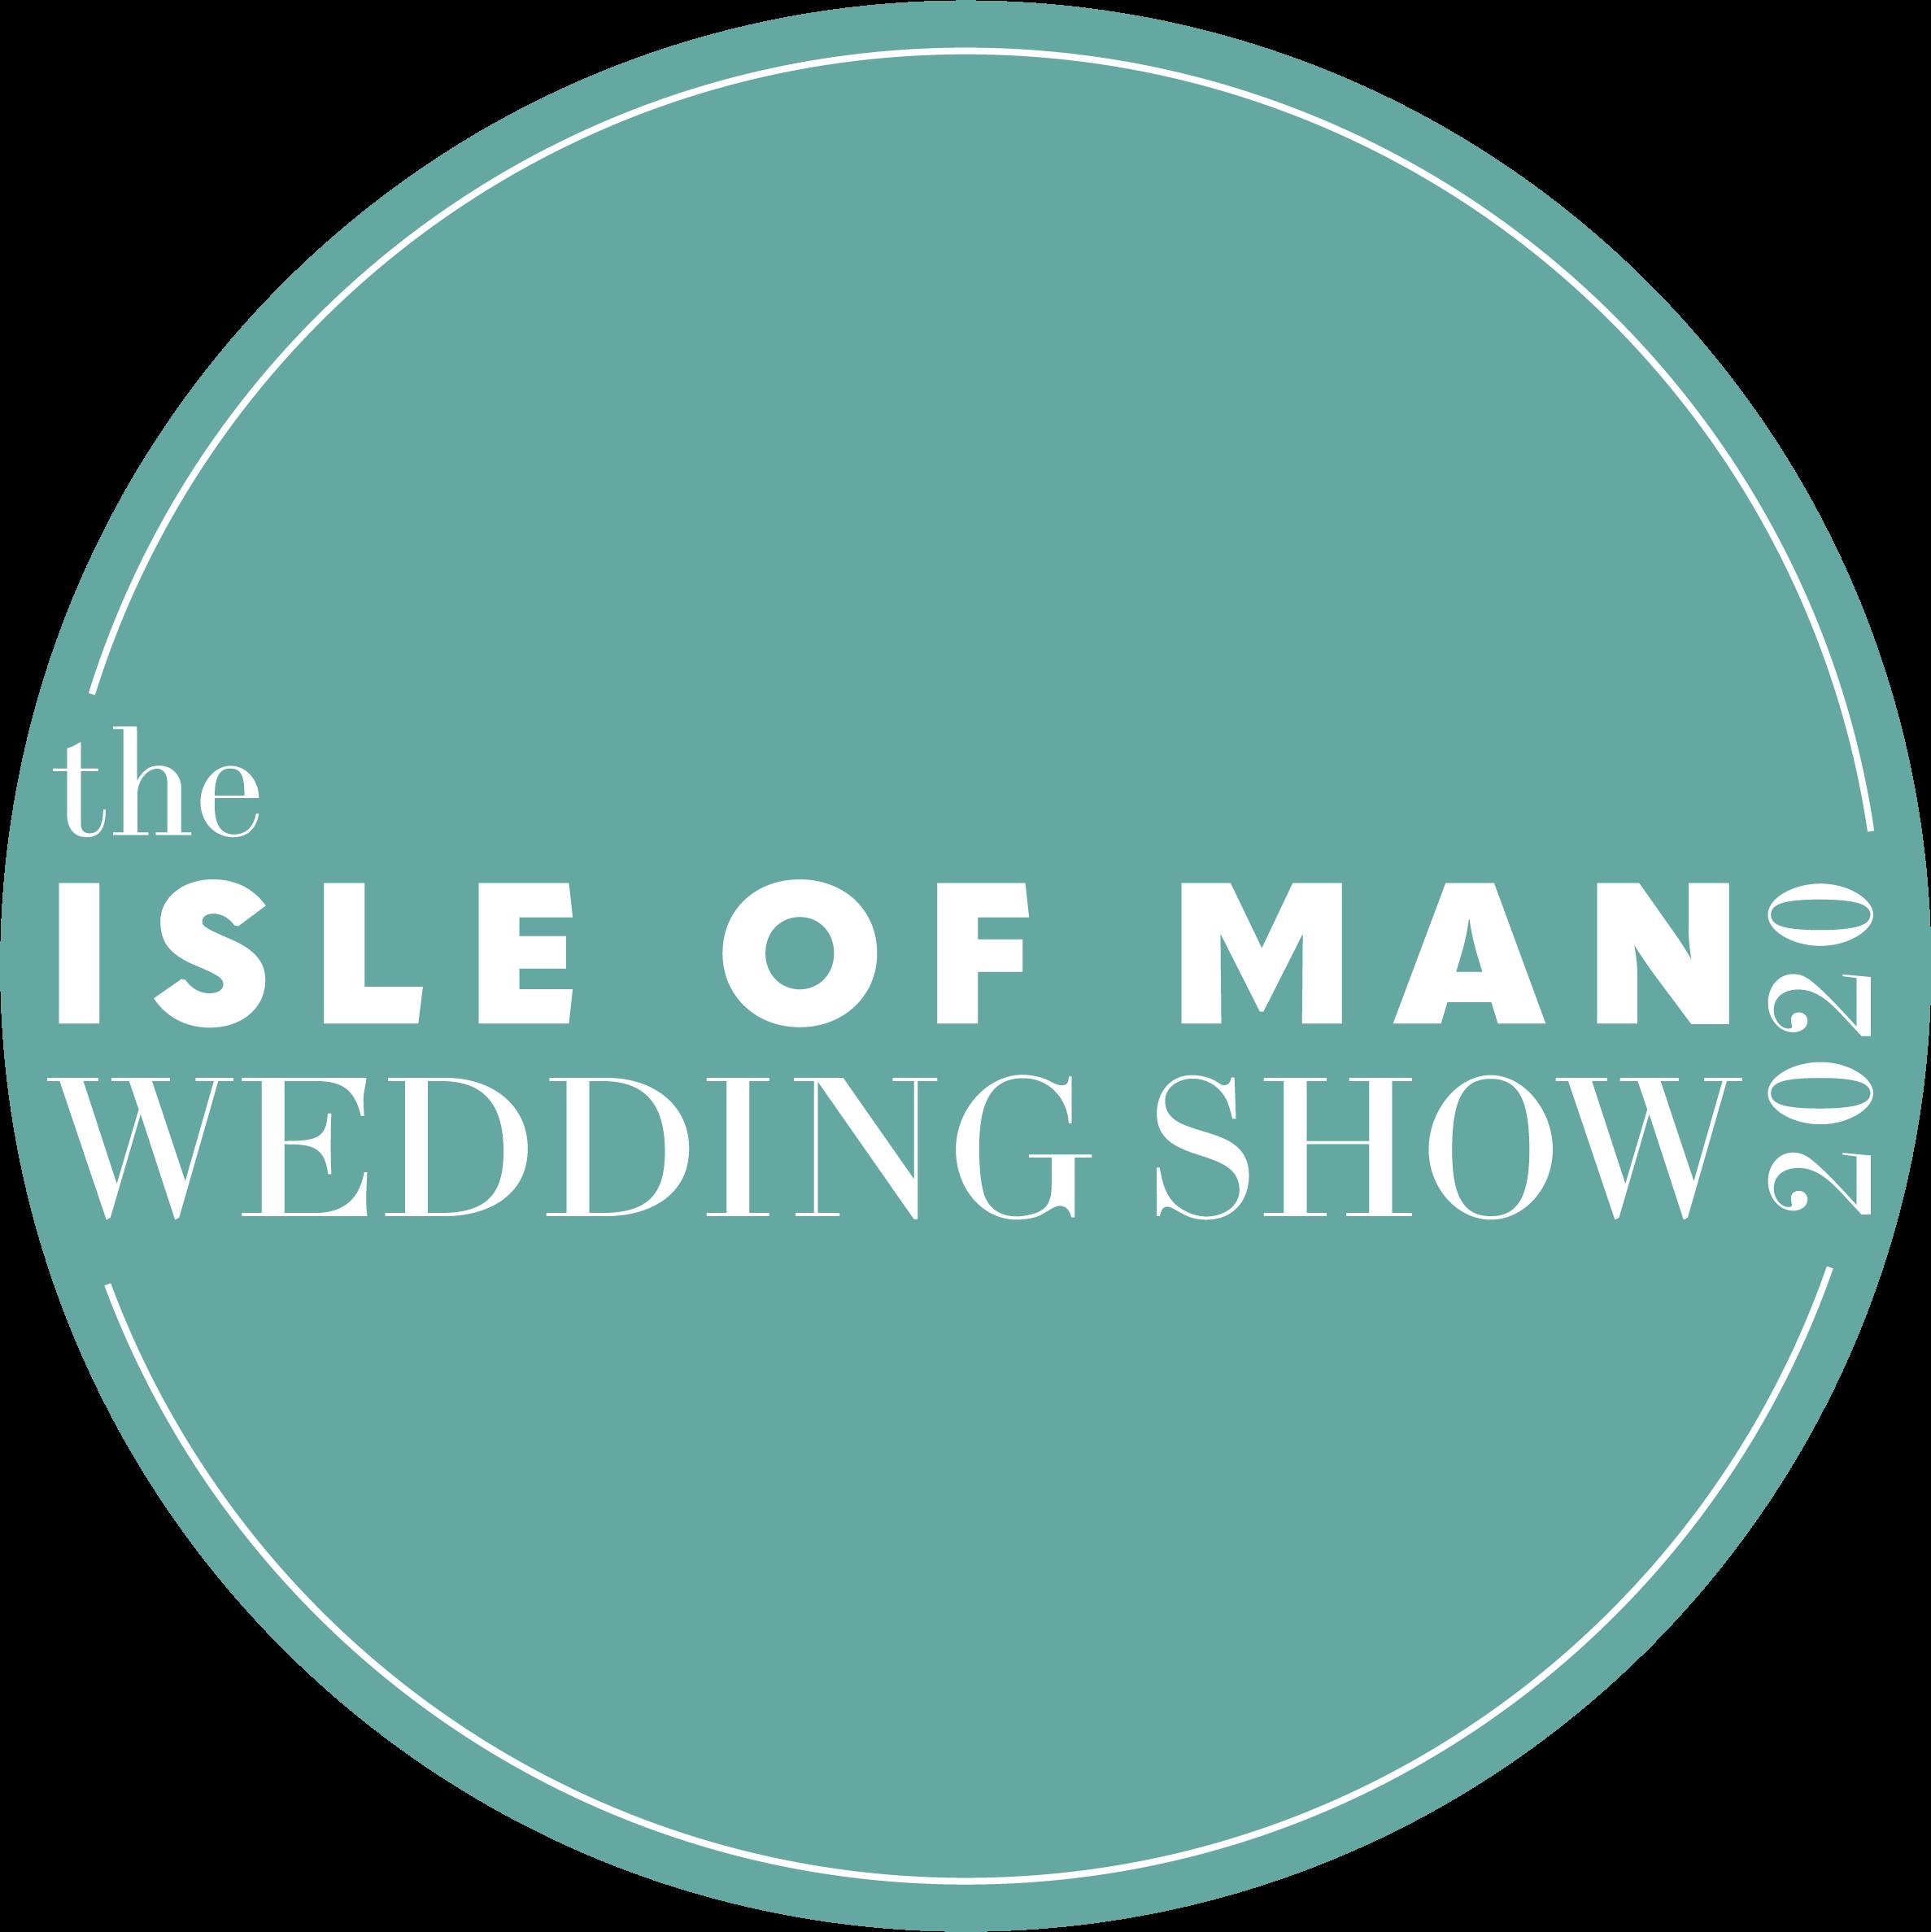 Isle of Man Wedding Show logo and branding